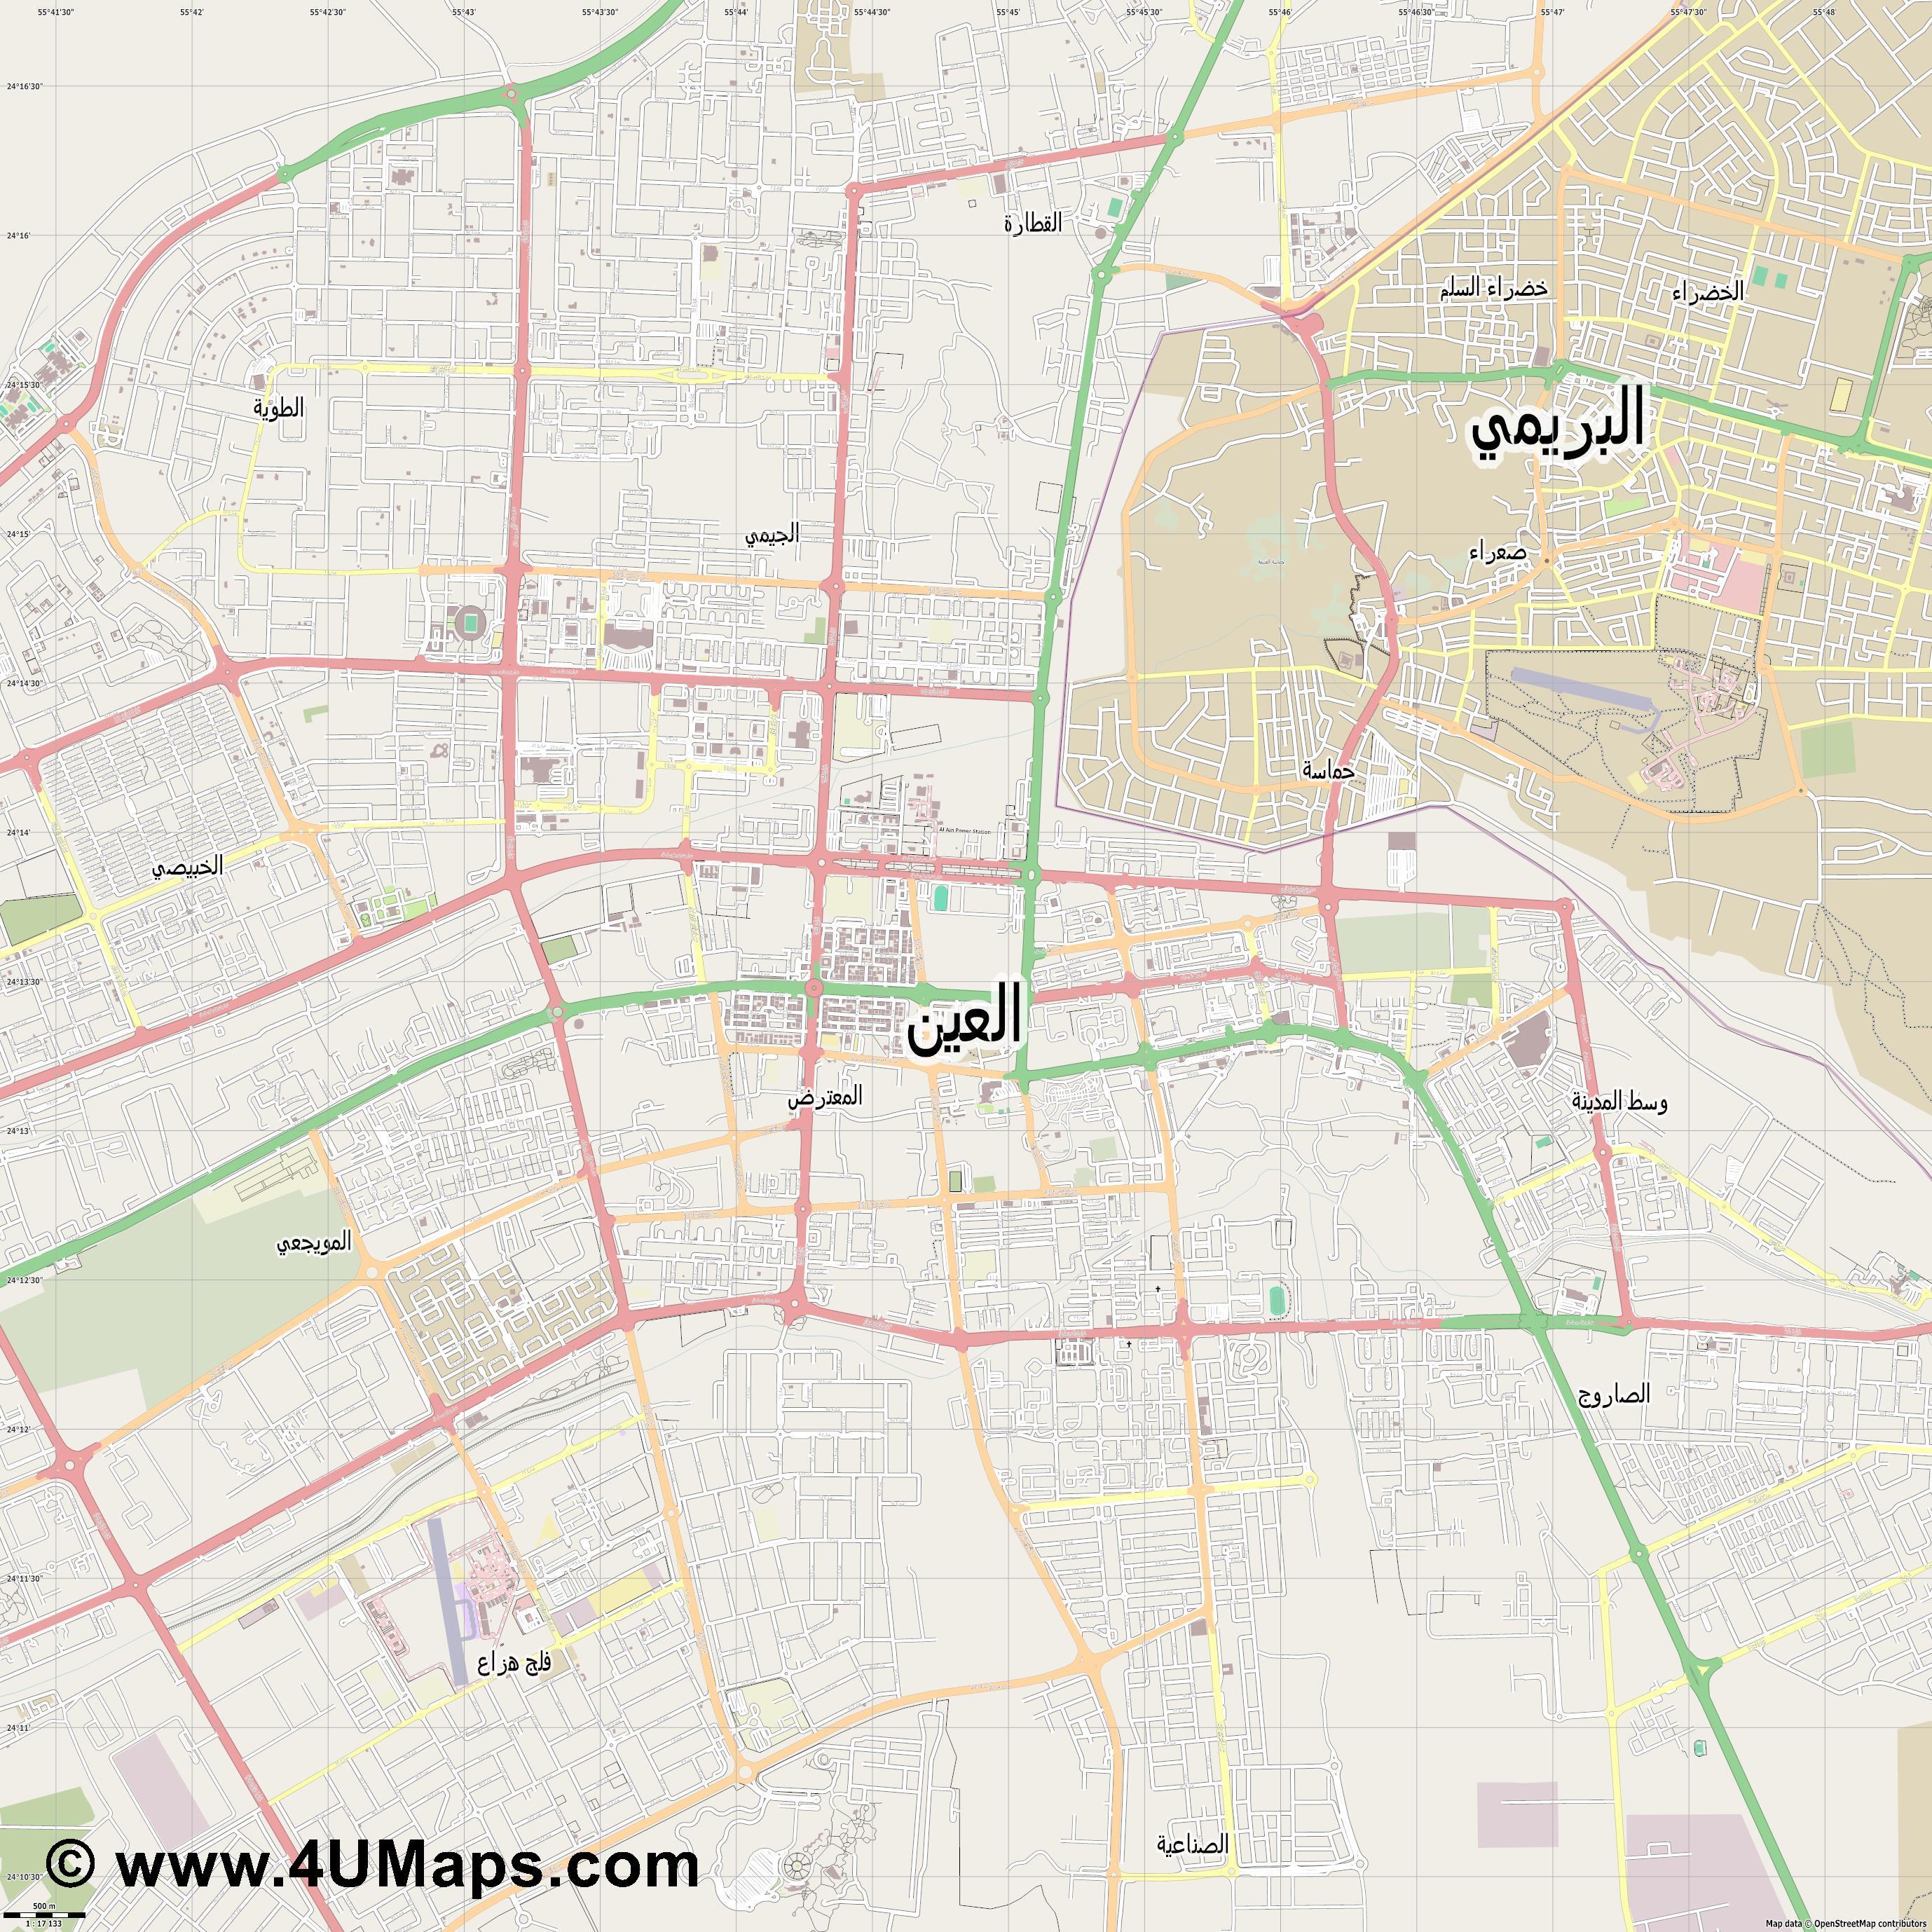 Svg Scalable Vector City Map Al Ain - Al ain map